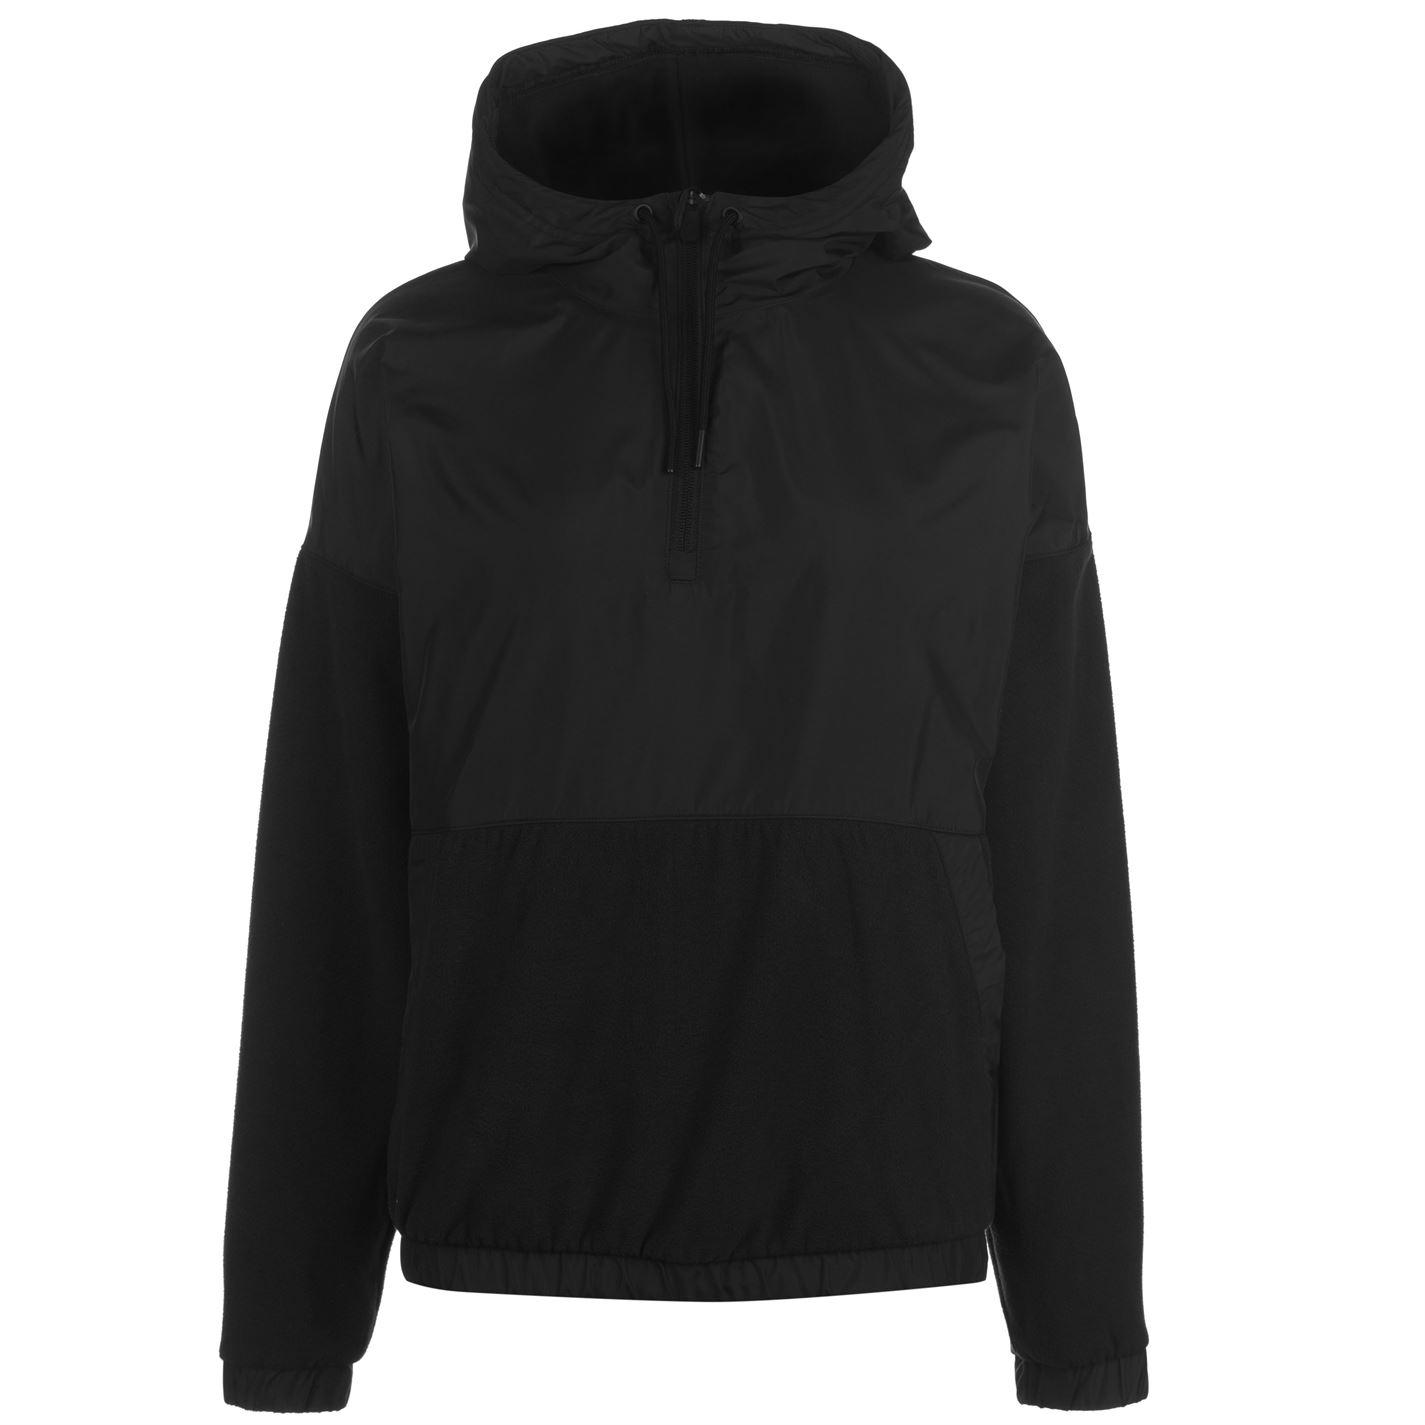 74d2712a57e ... Reebok Micro Fleece Hoodie dámská Black. -18%. mikina ...